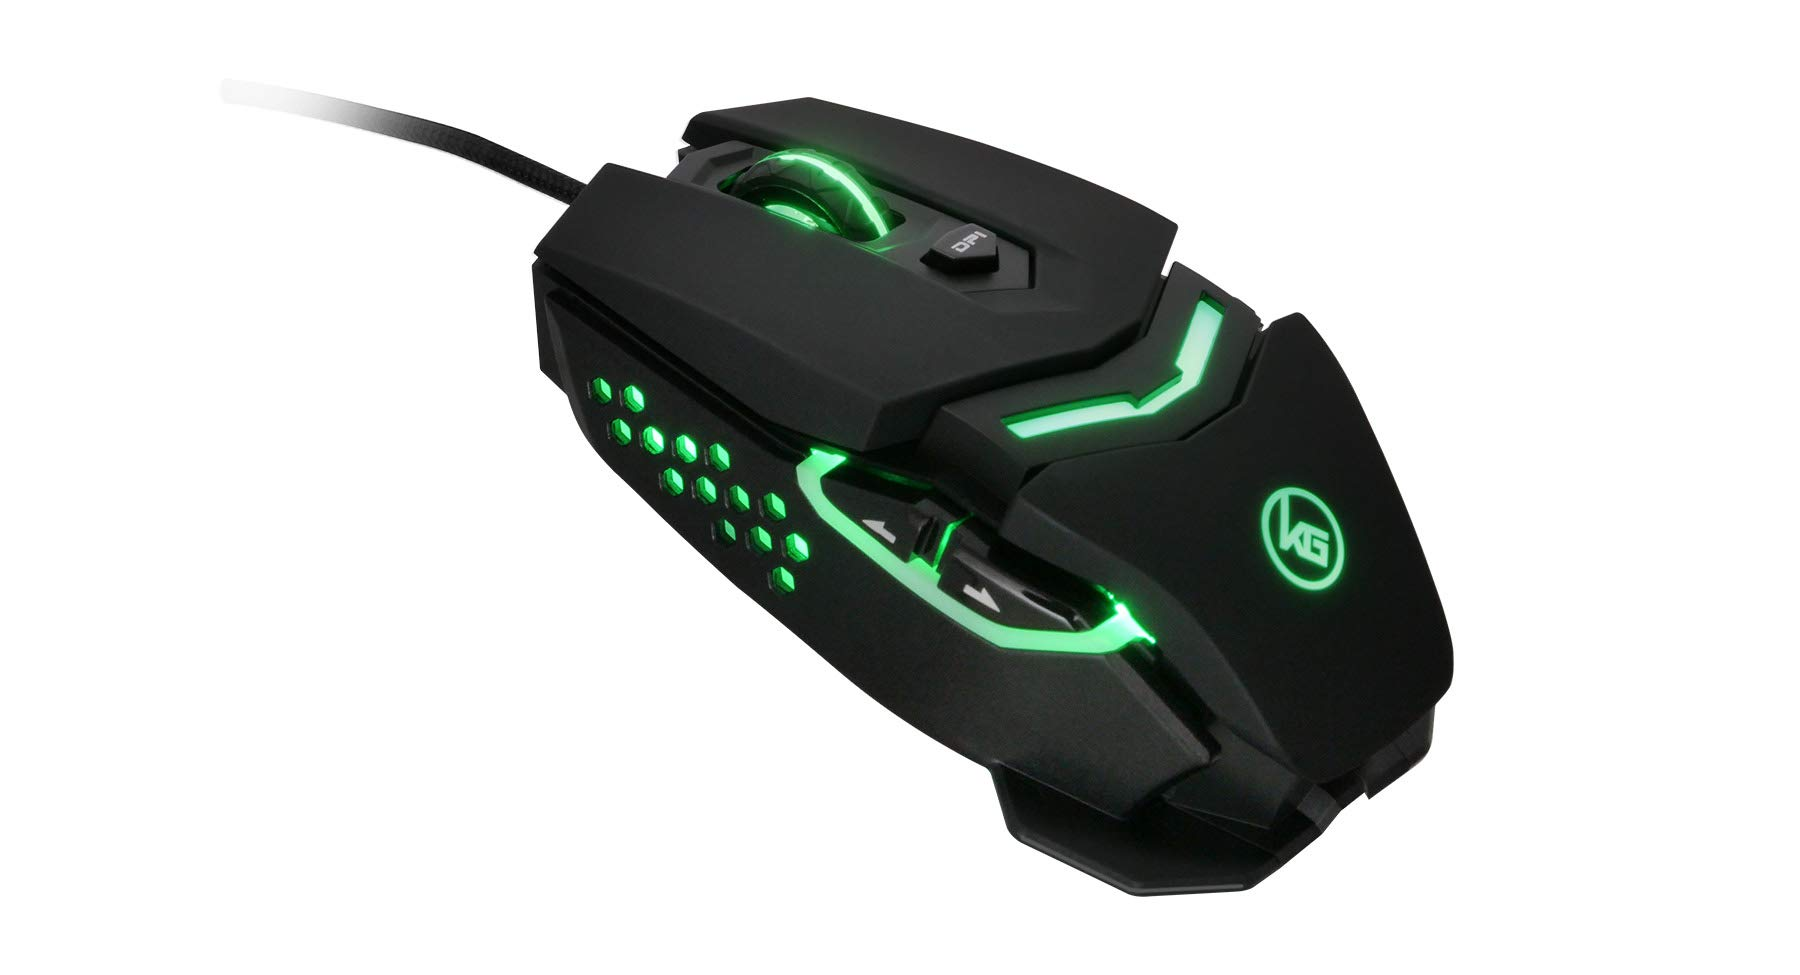 Mouse Gamer :  IOGEAR Kaliber FOKUS II Professional, GME671